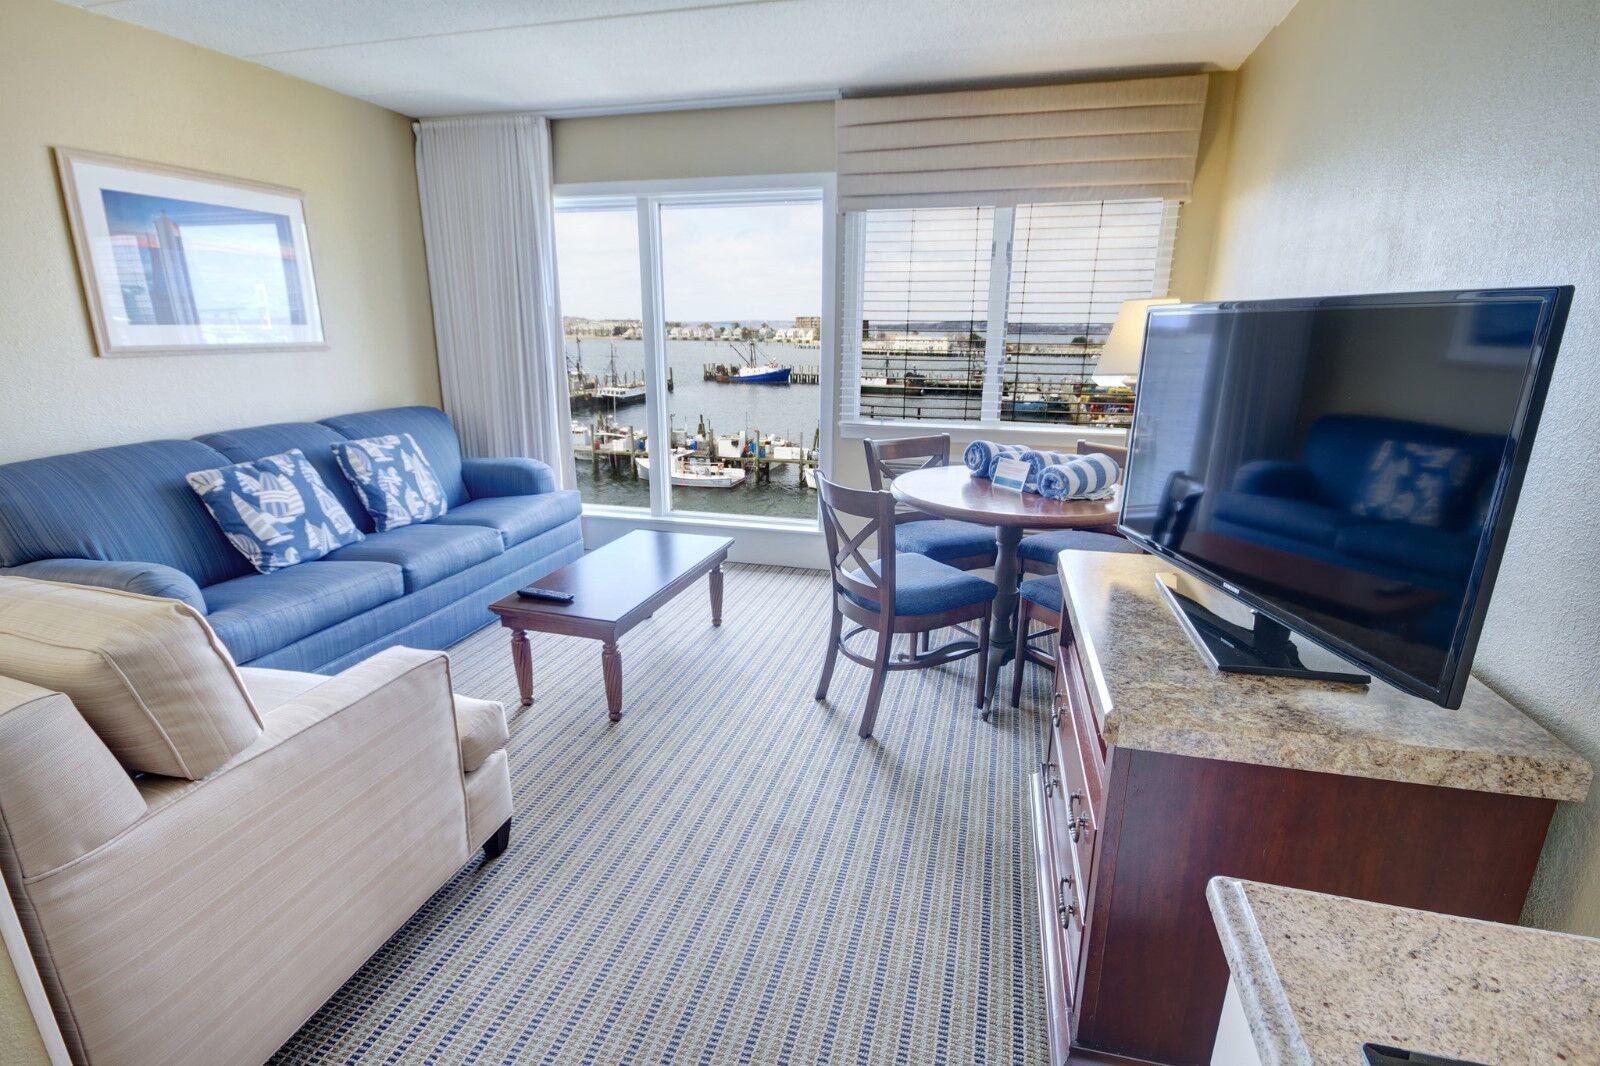 Wyndham Inn On Long Wharf Timeshare Newport RI - $1.00